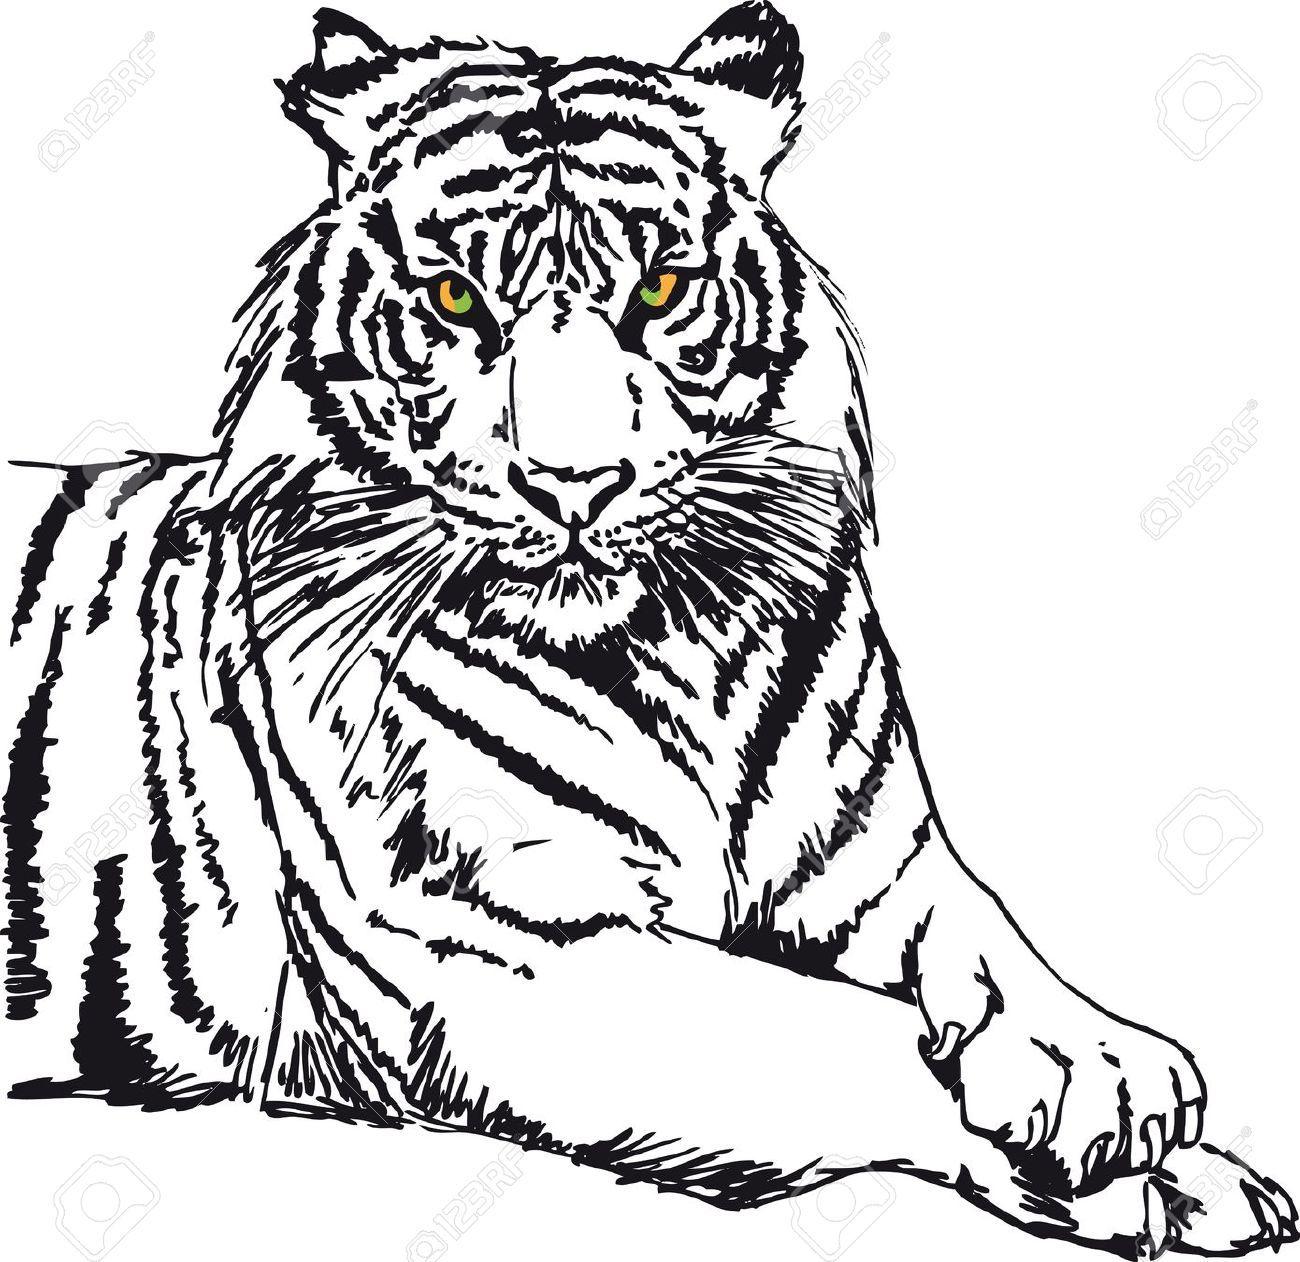 illustration of tiger pictures to pin on pinterest Yin Yang Lotus Mandala Yin Yang Mandala Coloring Pages